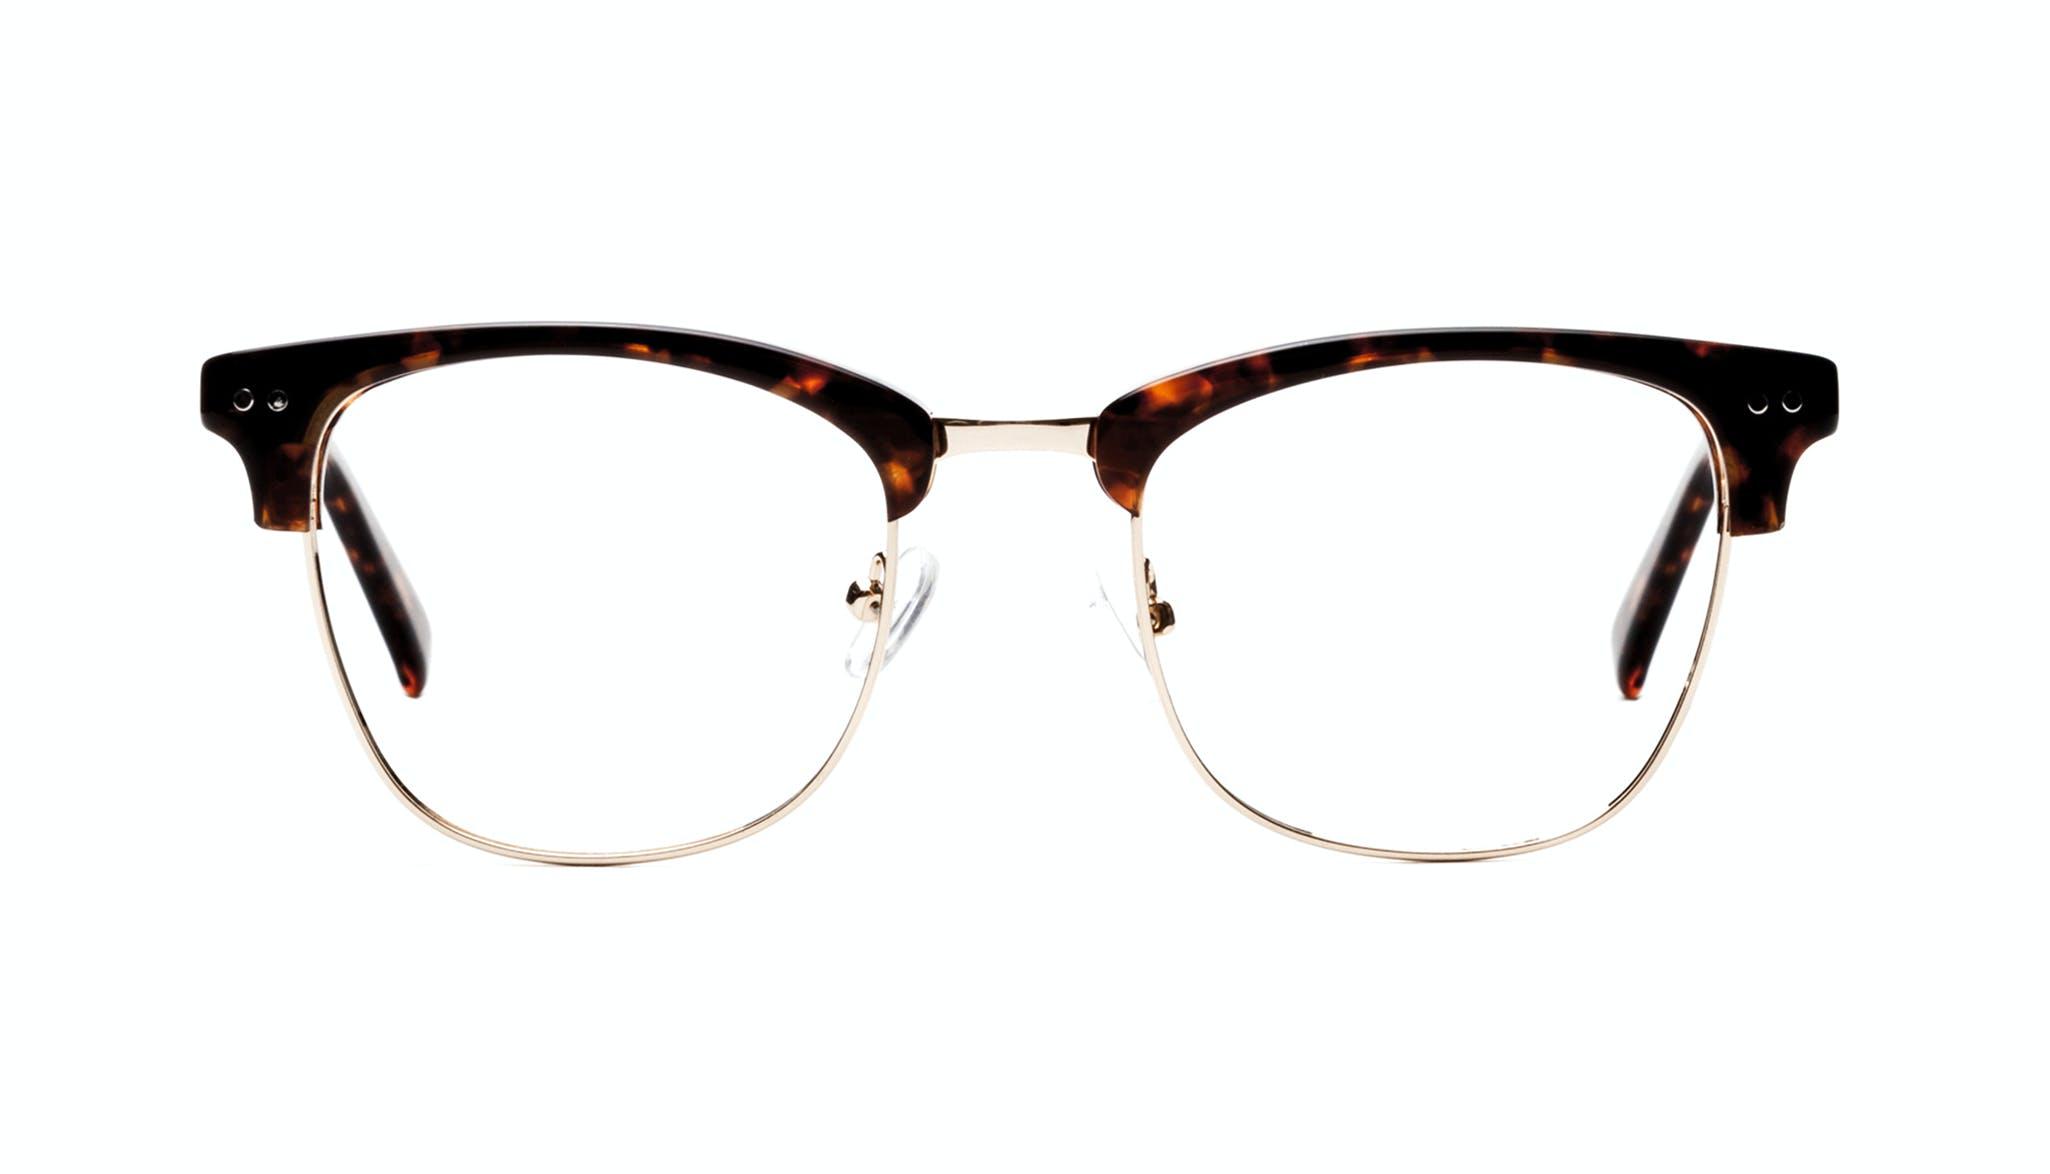 Affordable Fashion Glasses Square Eyeglasses Men Lift Gold Sepia